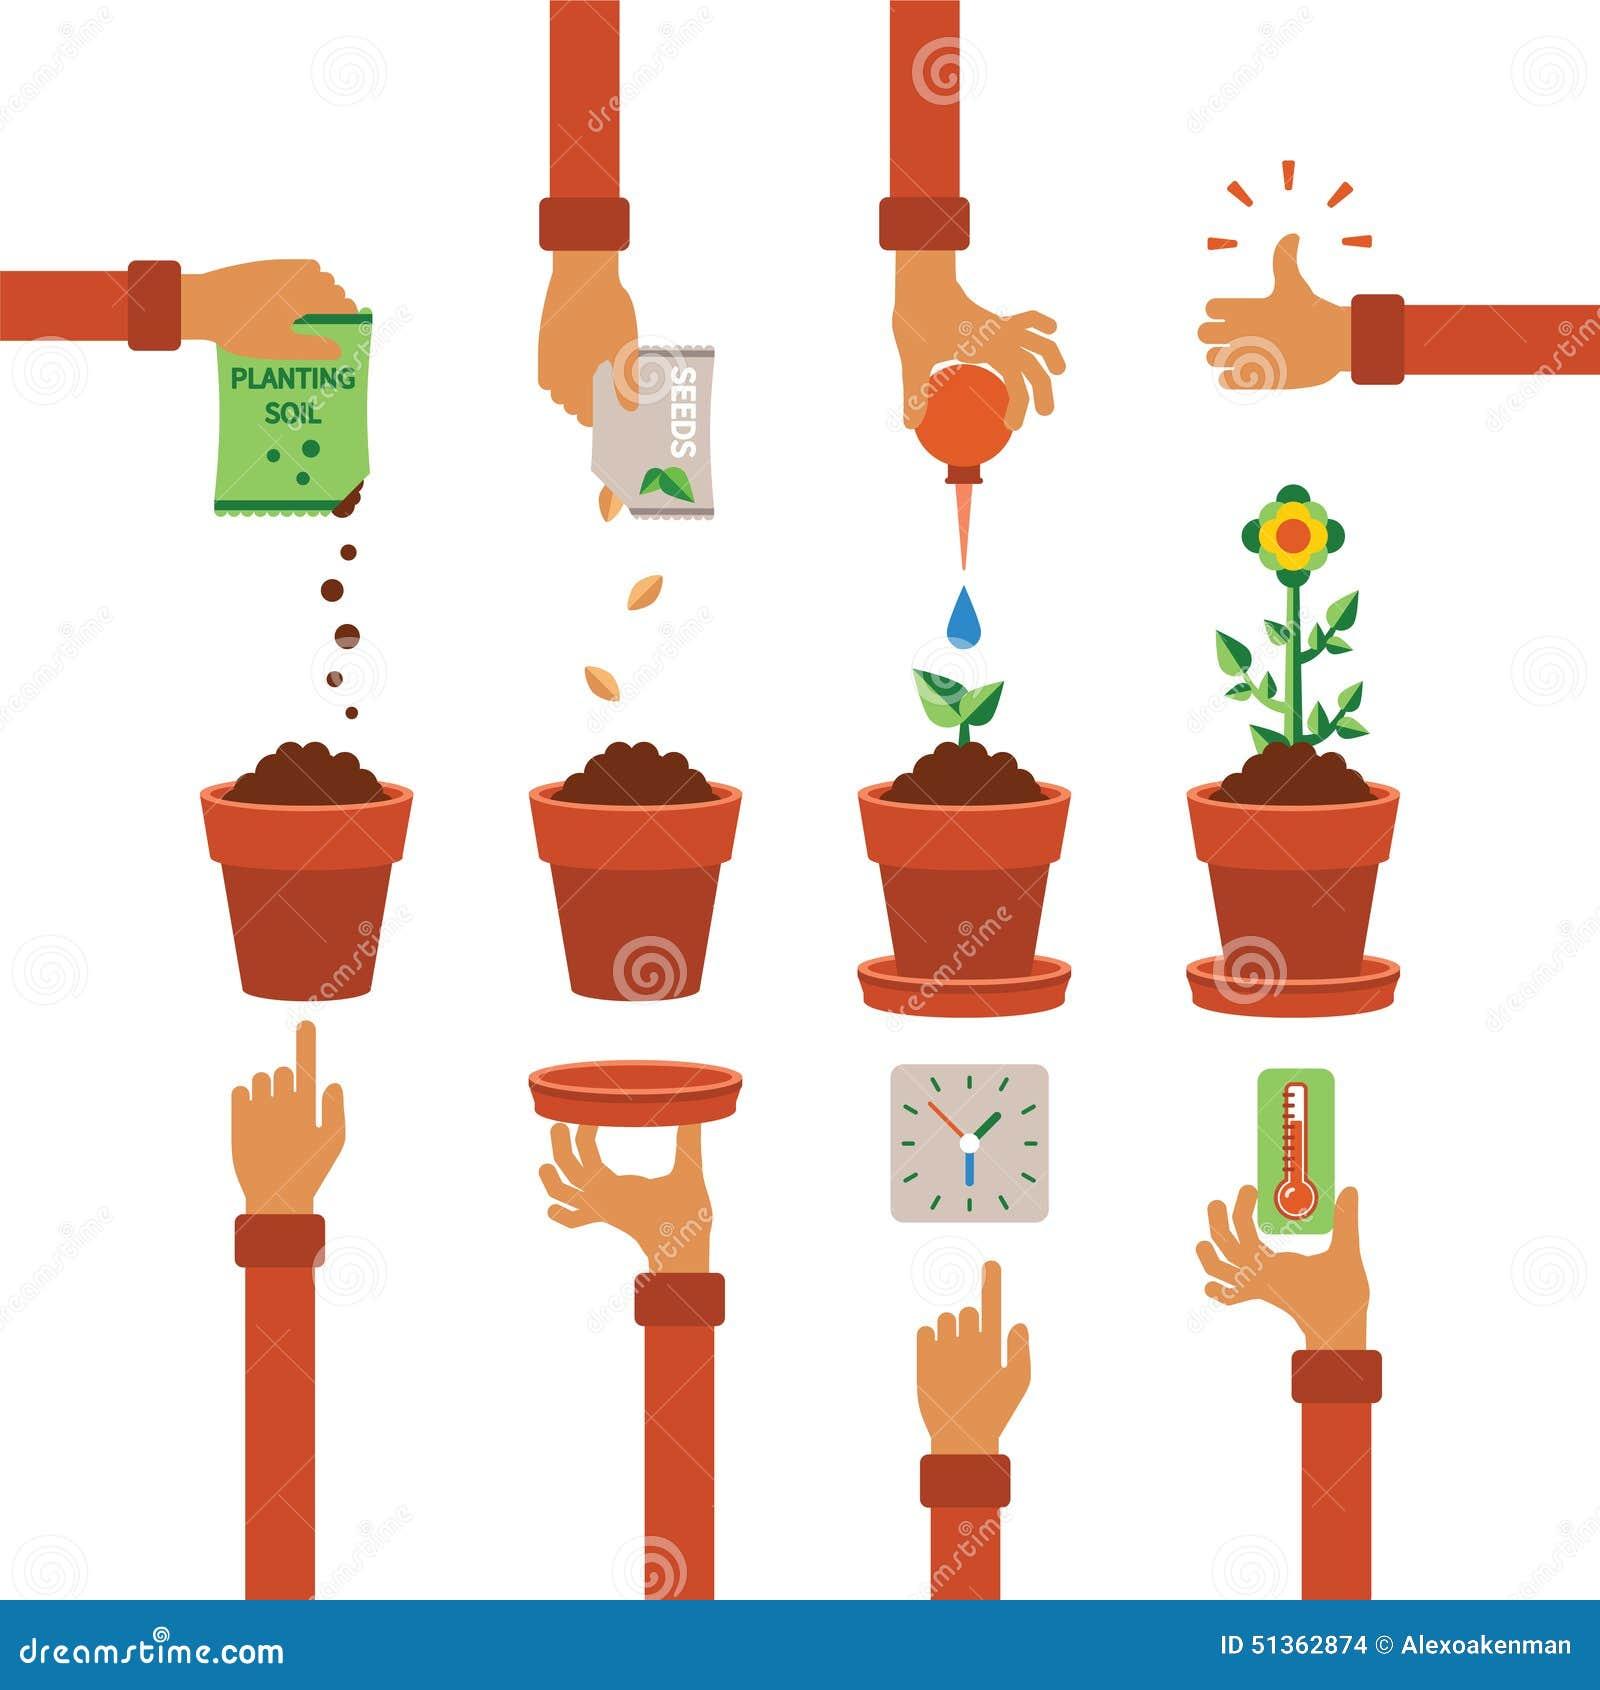 Free Worksheets xl worksheet : Vector Timeline Infographic Concept Of Planting Process ...